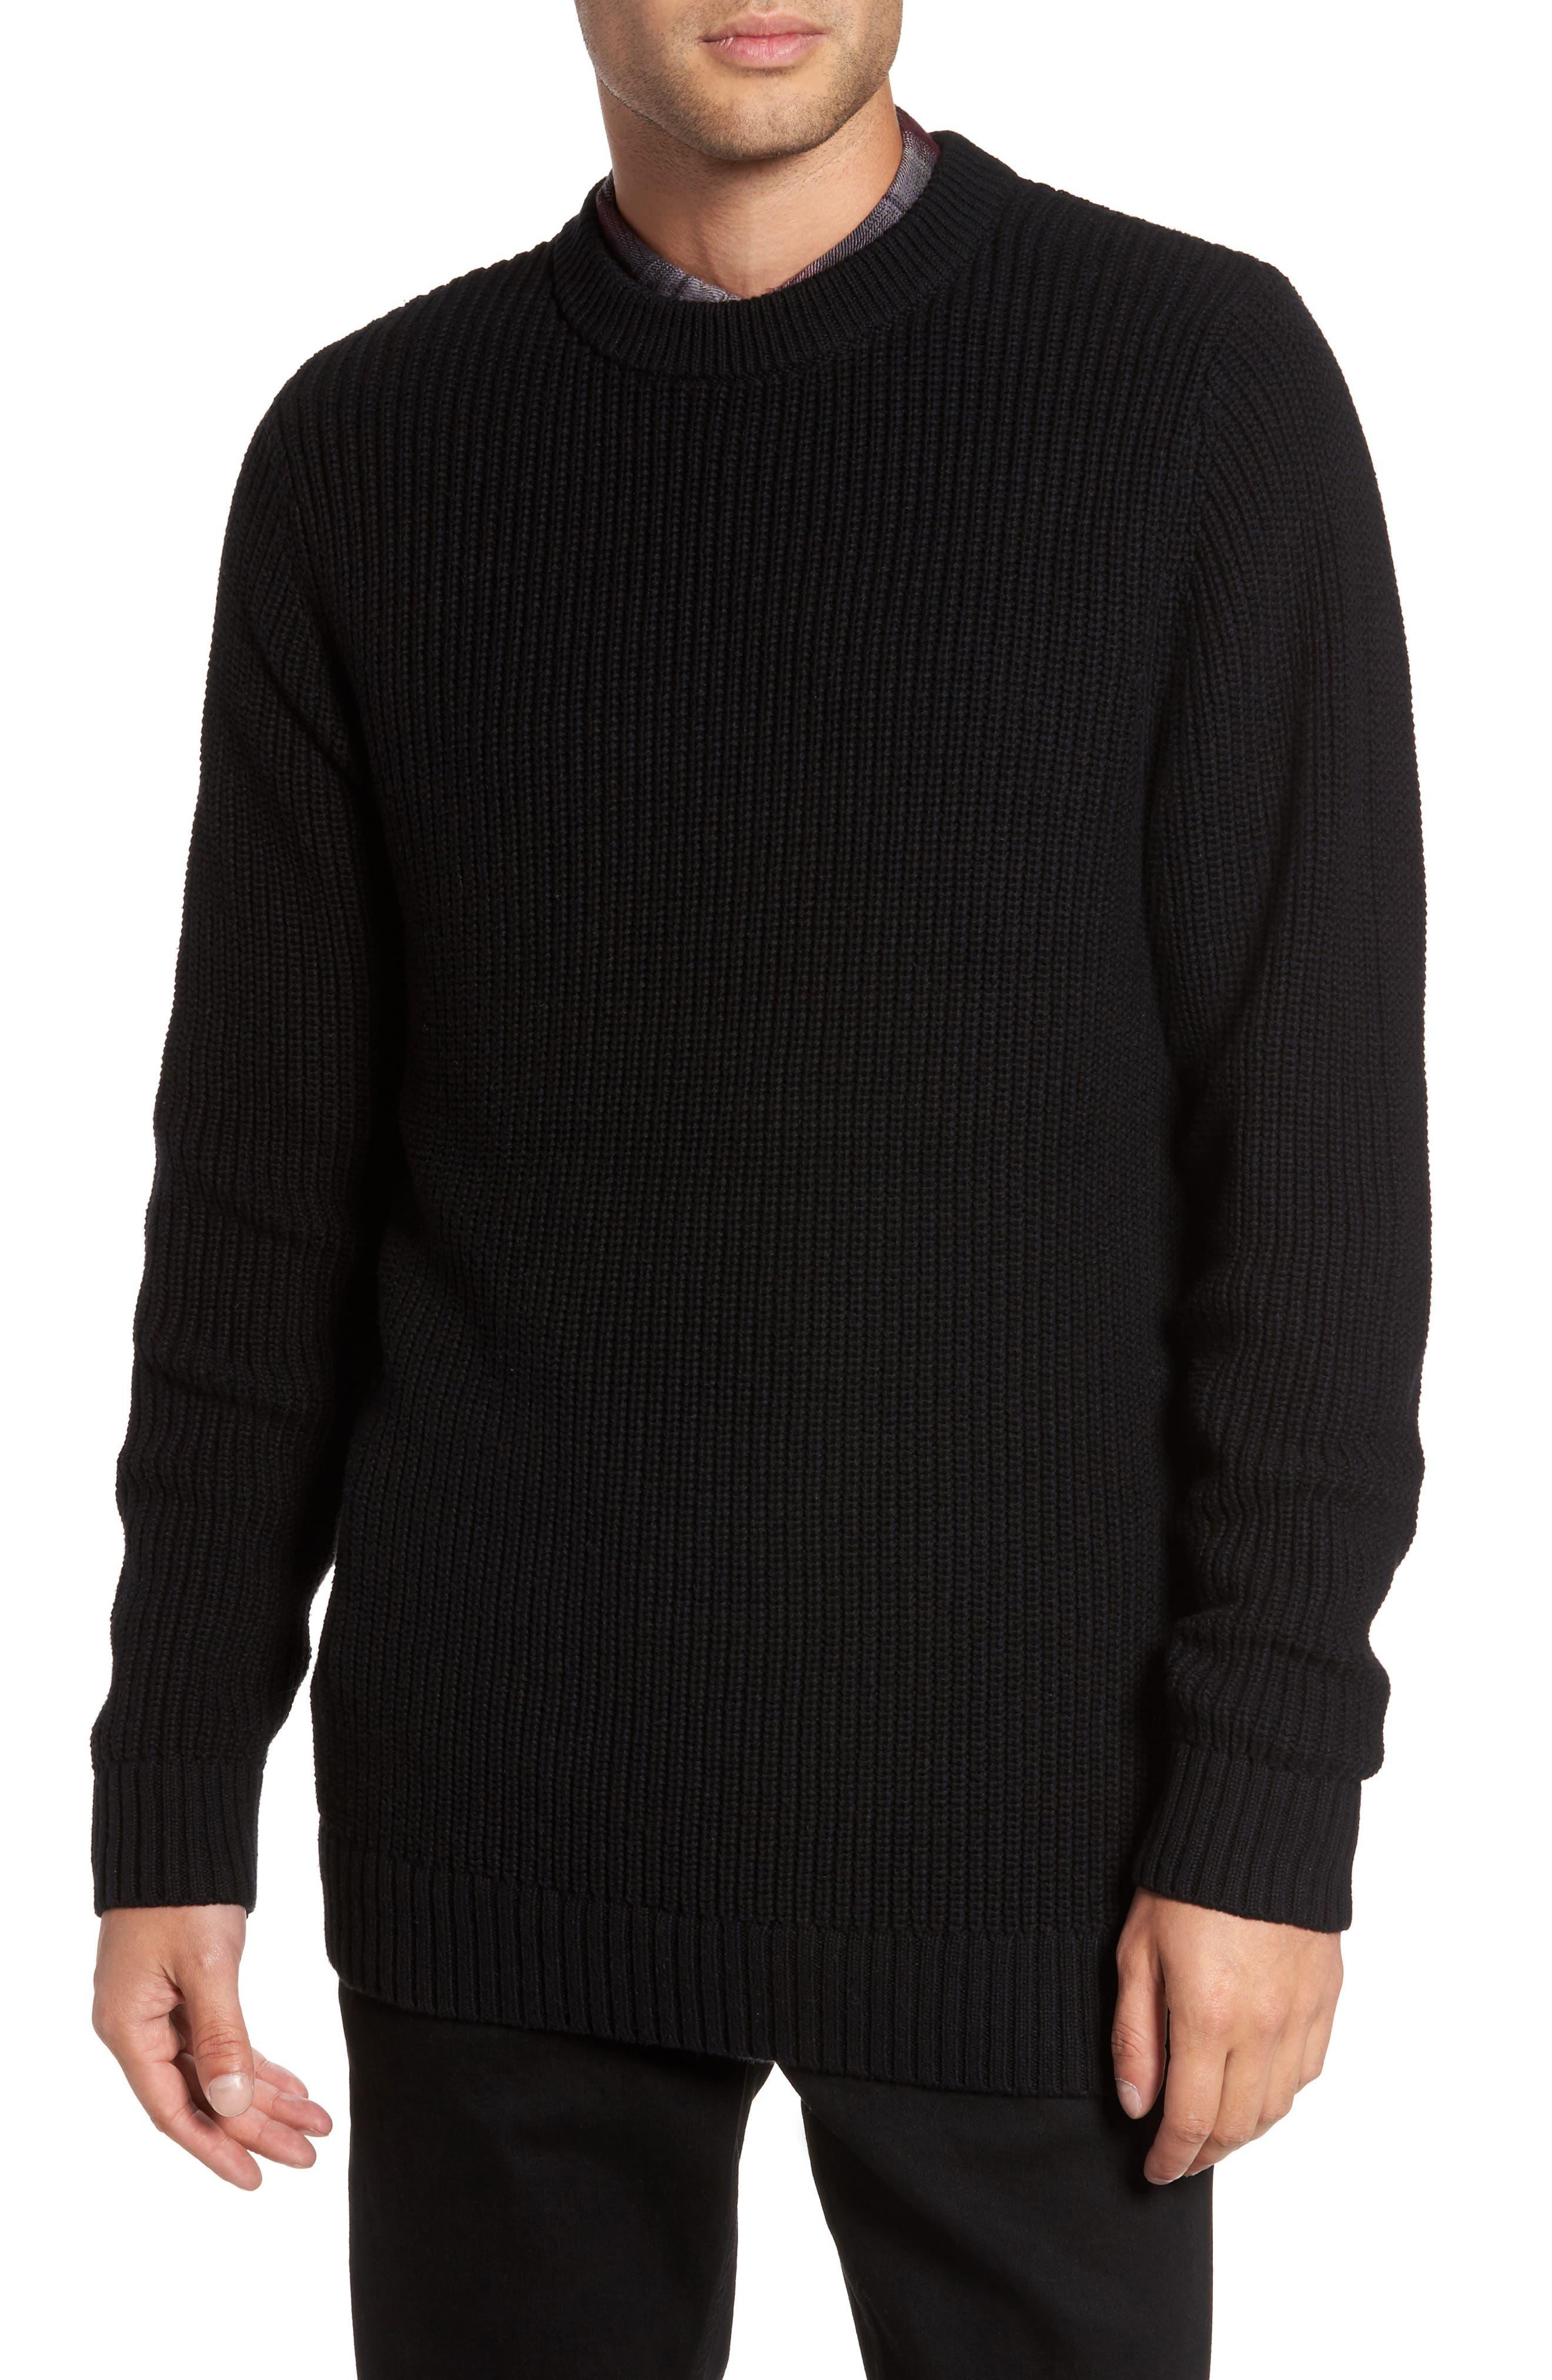 Treasure & Bond Shaker Stitch Sweater